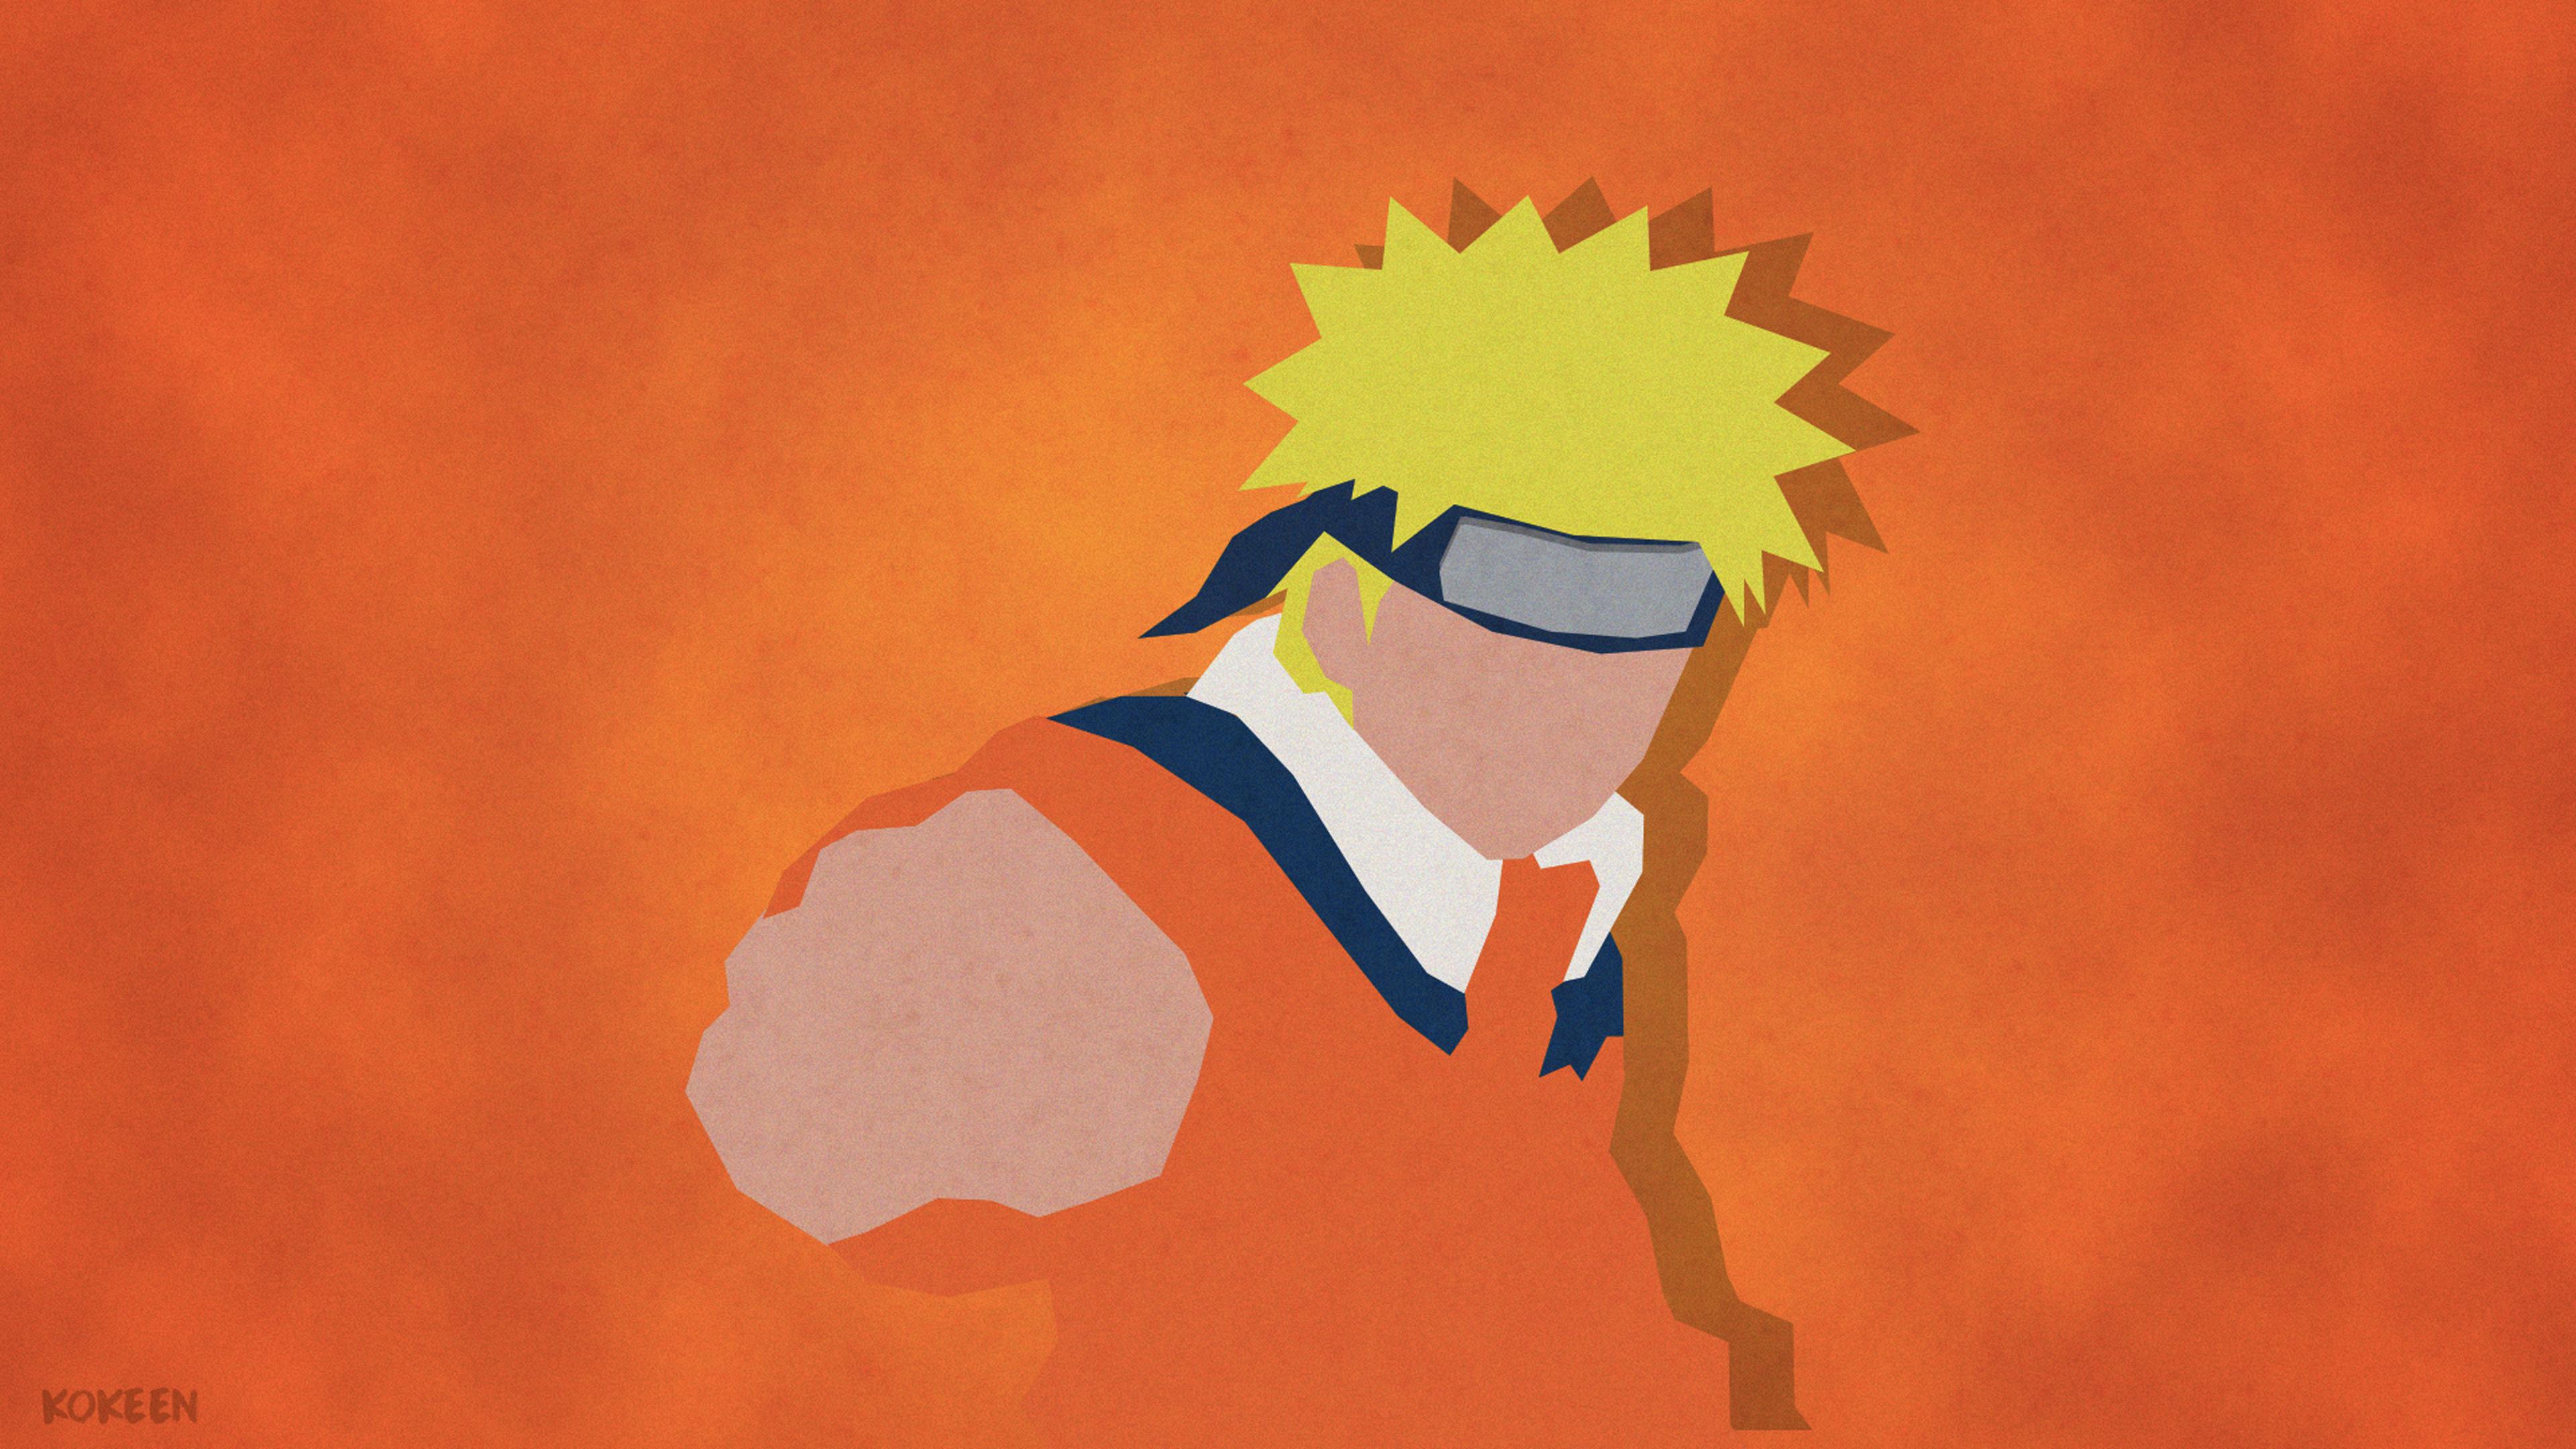 Uzumaki Naruto Shippuuden Minimalism 4k Hd Anime 4k Wallpapers